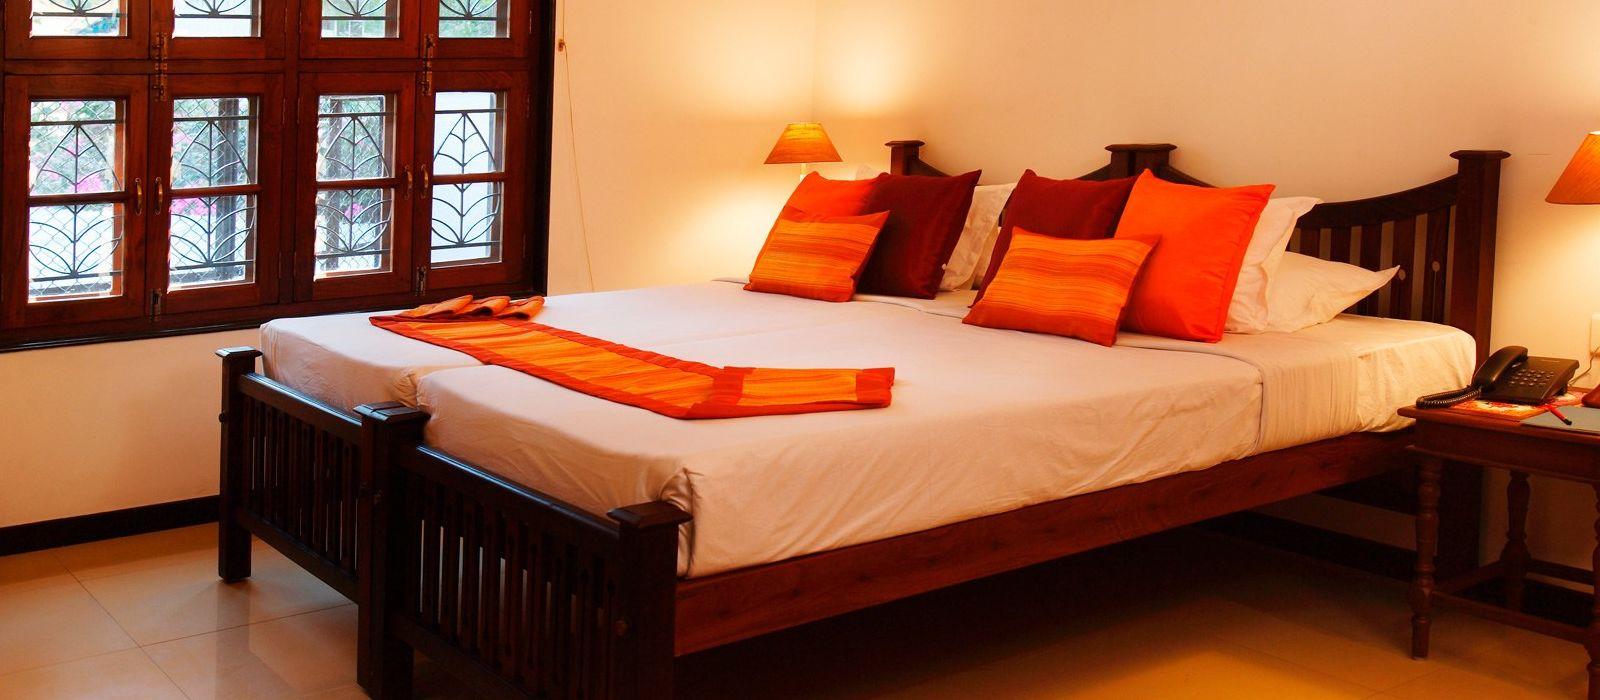 Hotel Laika South India